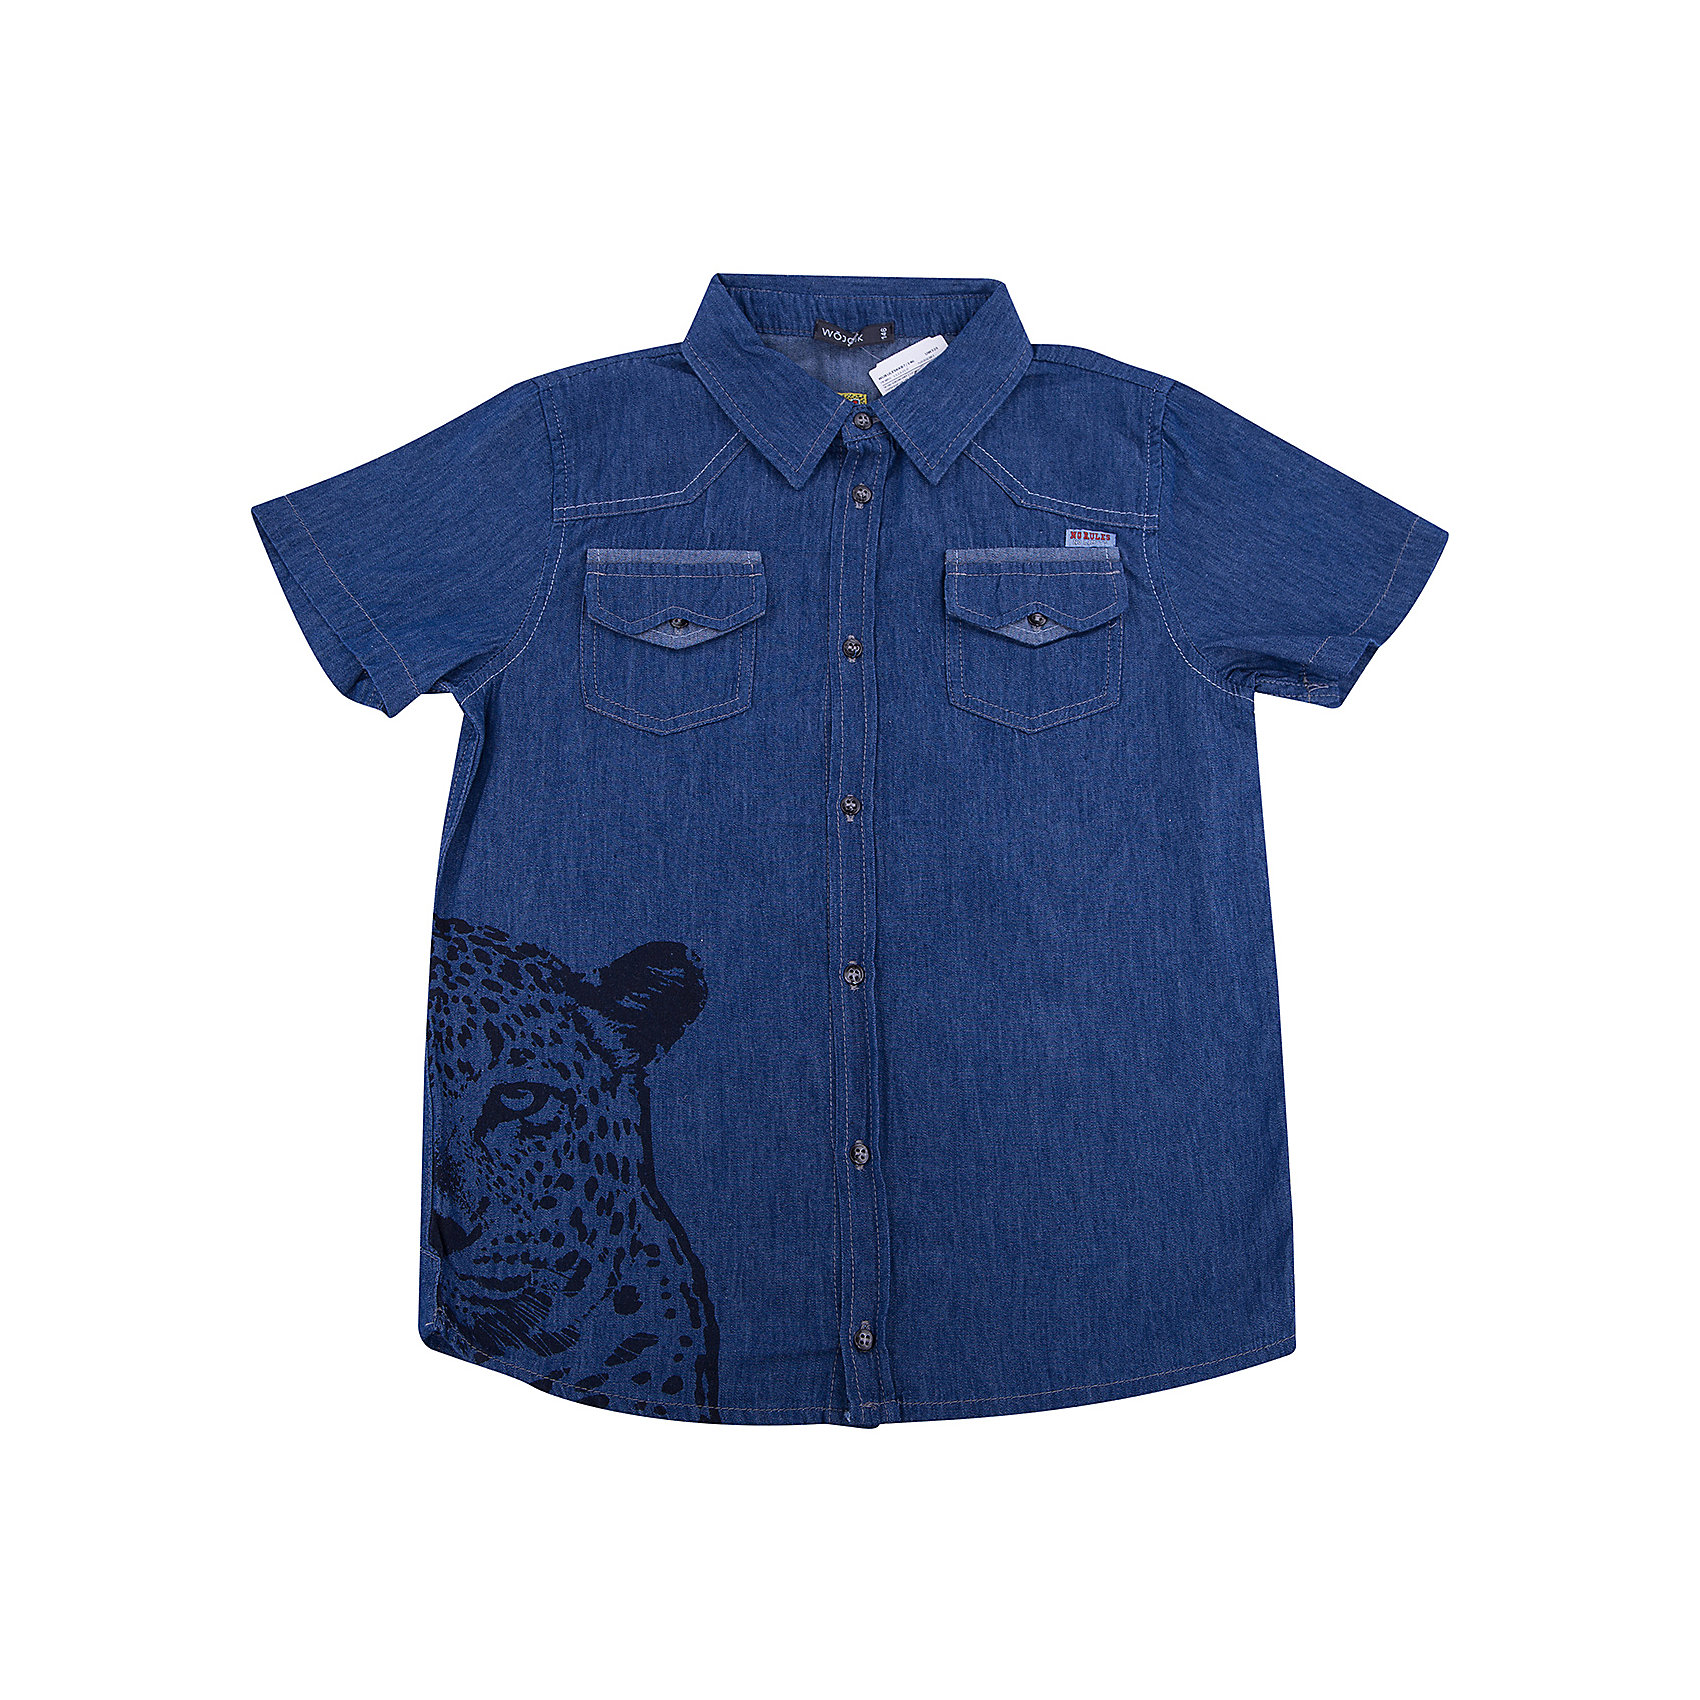 Рубашка для мальчика WojcikБлузки и рубашки<br>Рубашка для мальчика Wojcik<br>Состав:<br>Хлопок 100%<br><br>Ширина мм: 174<br>Глубина мм: 10<br>Высота мм: 169<br>Вес г: 157<br>Цвет: синий<br>Возраст от месяцев: 48<br>Возраст до месяцев: 60<br>Пол: Мужской<br>Возраст: Детский<br>Размер: 110,116,122,128,134,140,146<br>SKU: 5588793